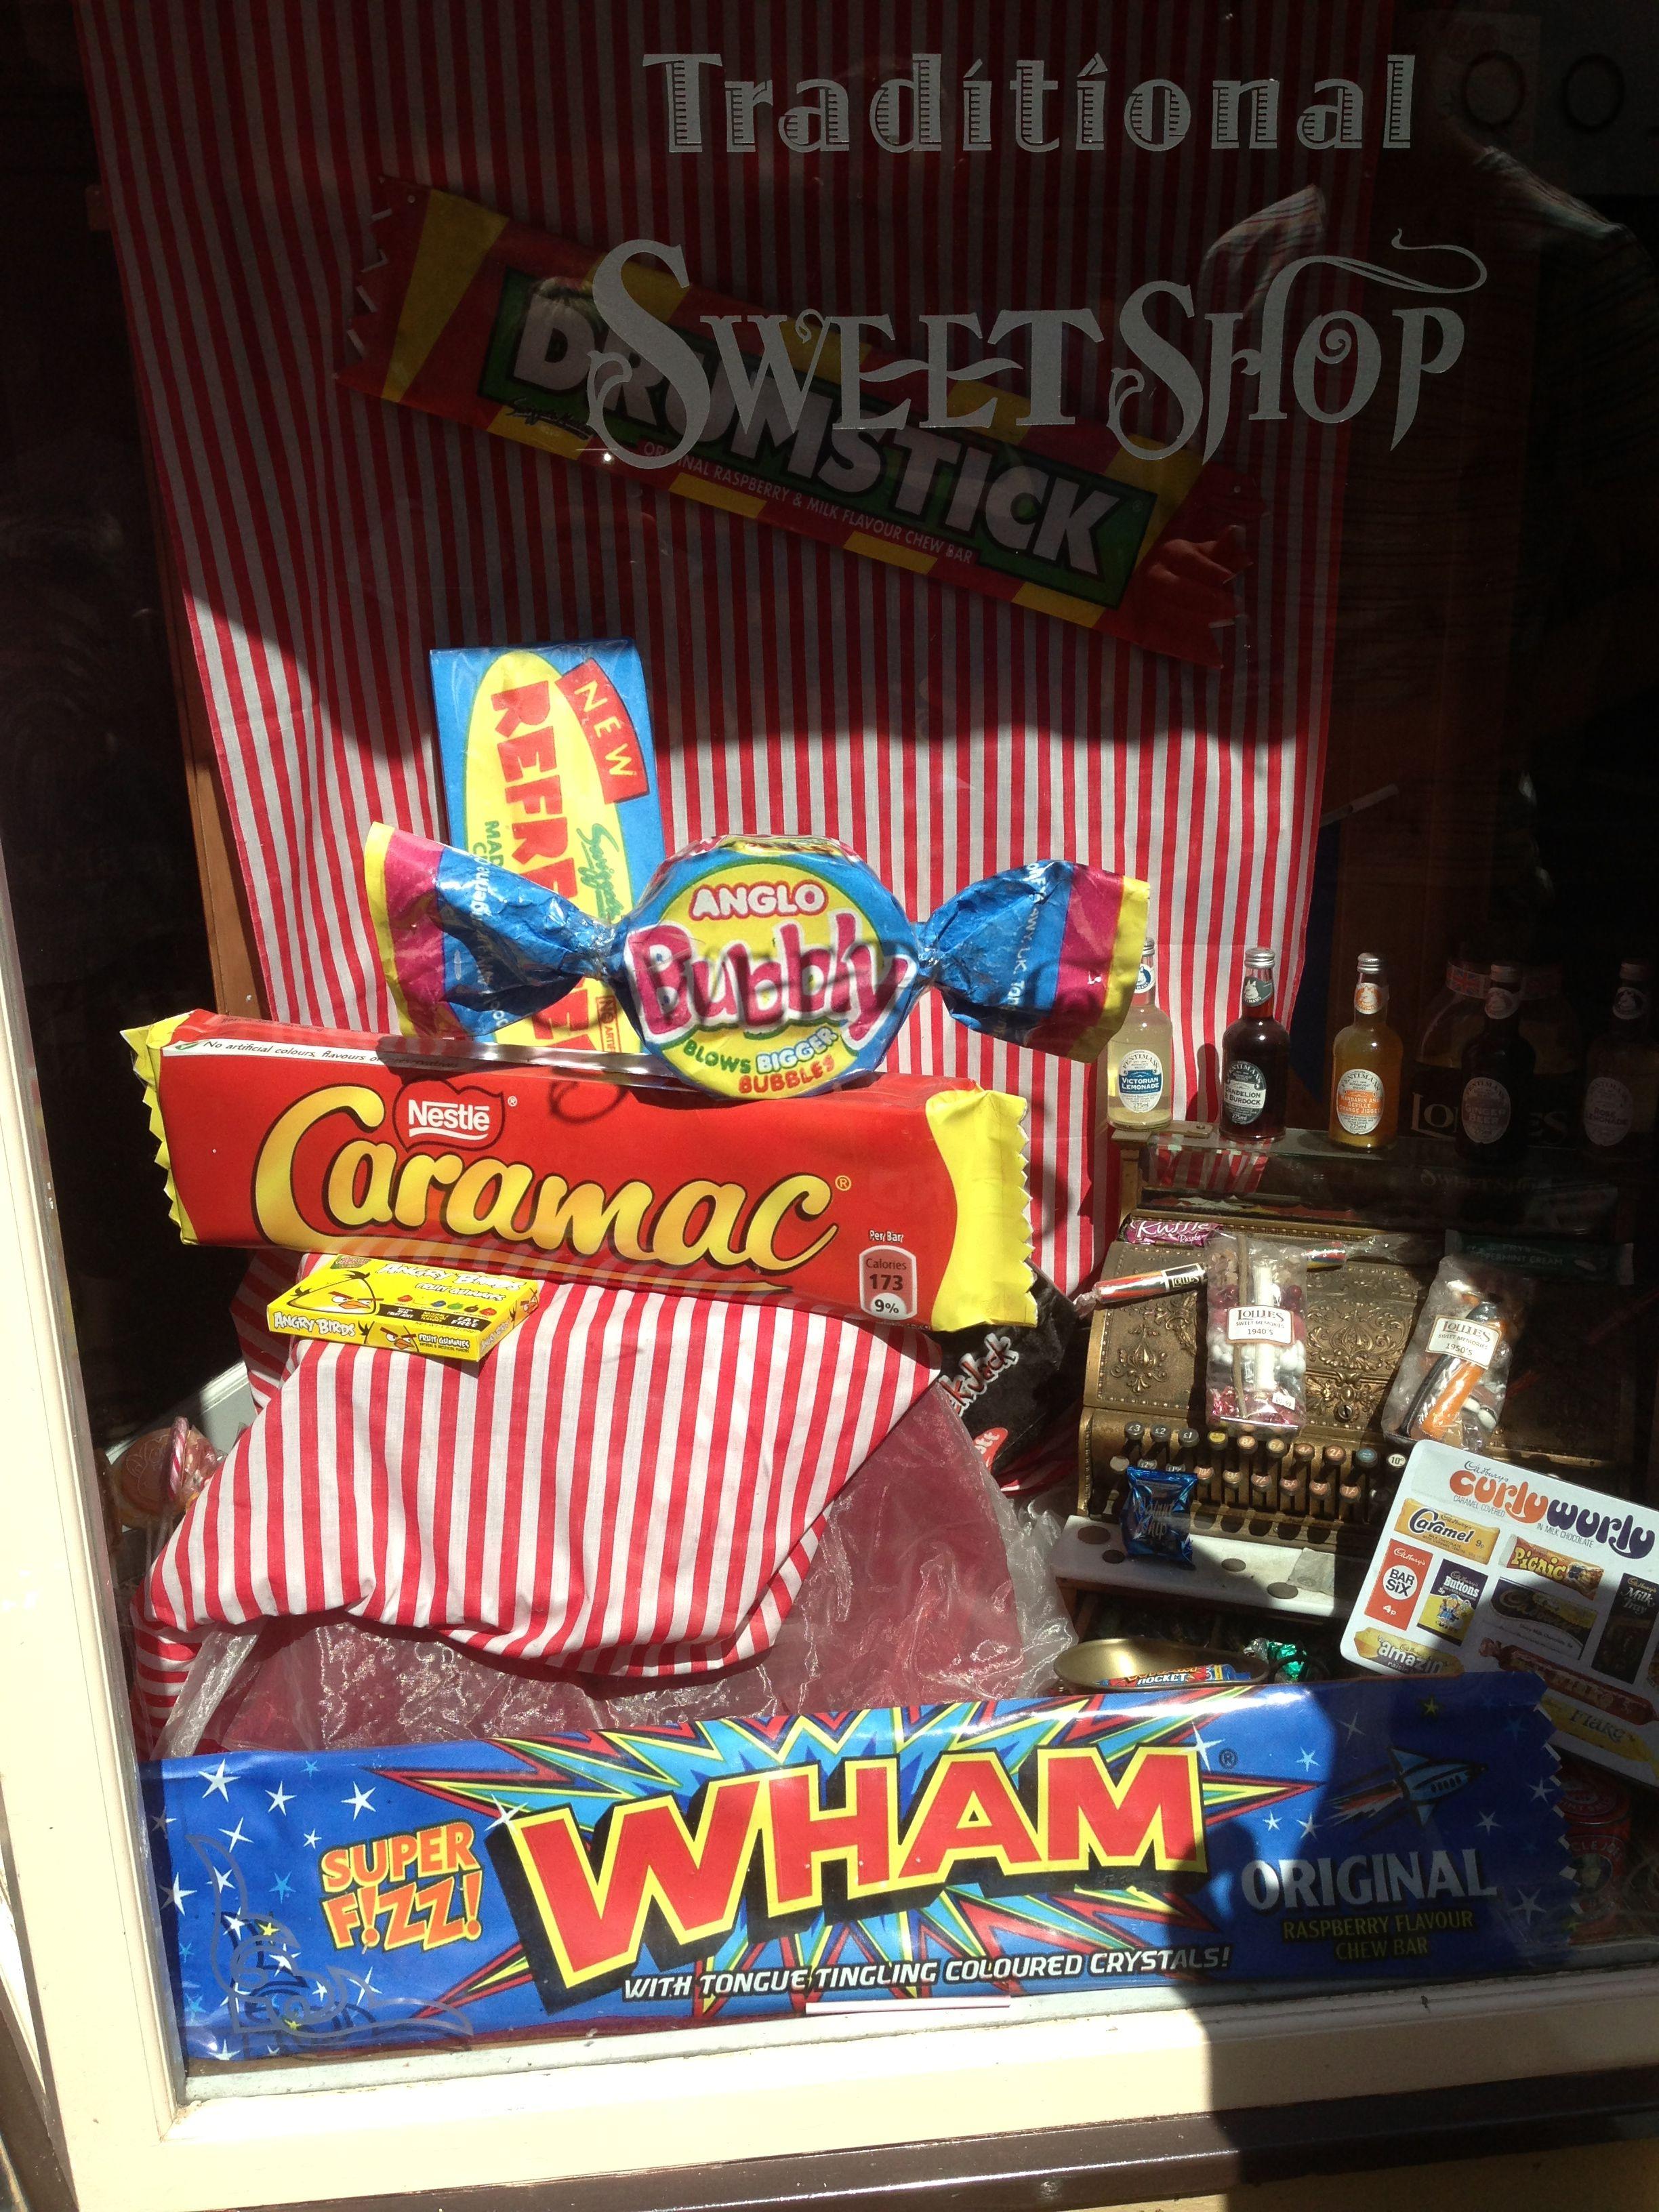 Vintage sweet shop www.aline-properties.co.uk